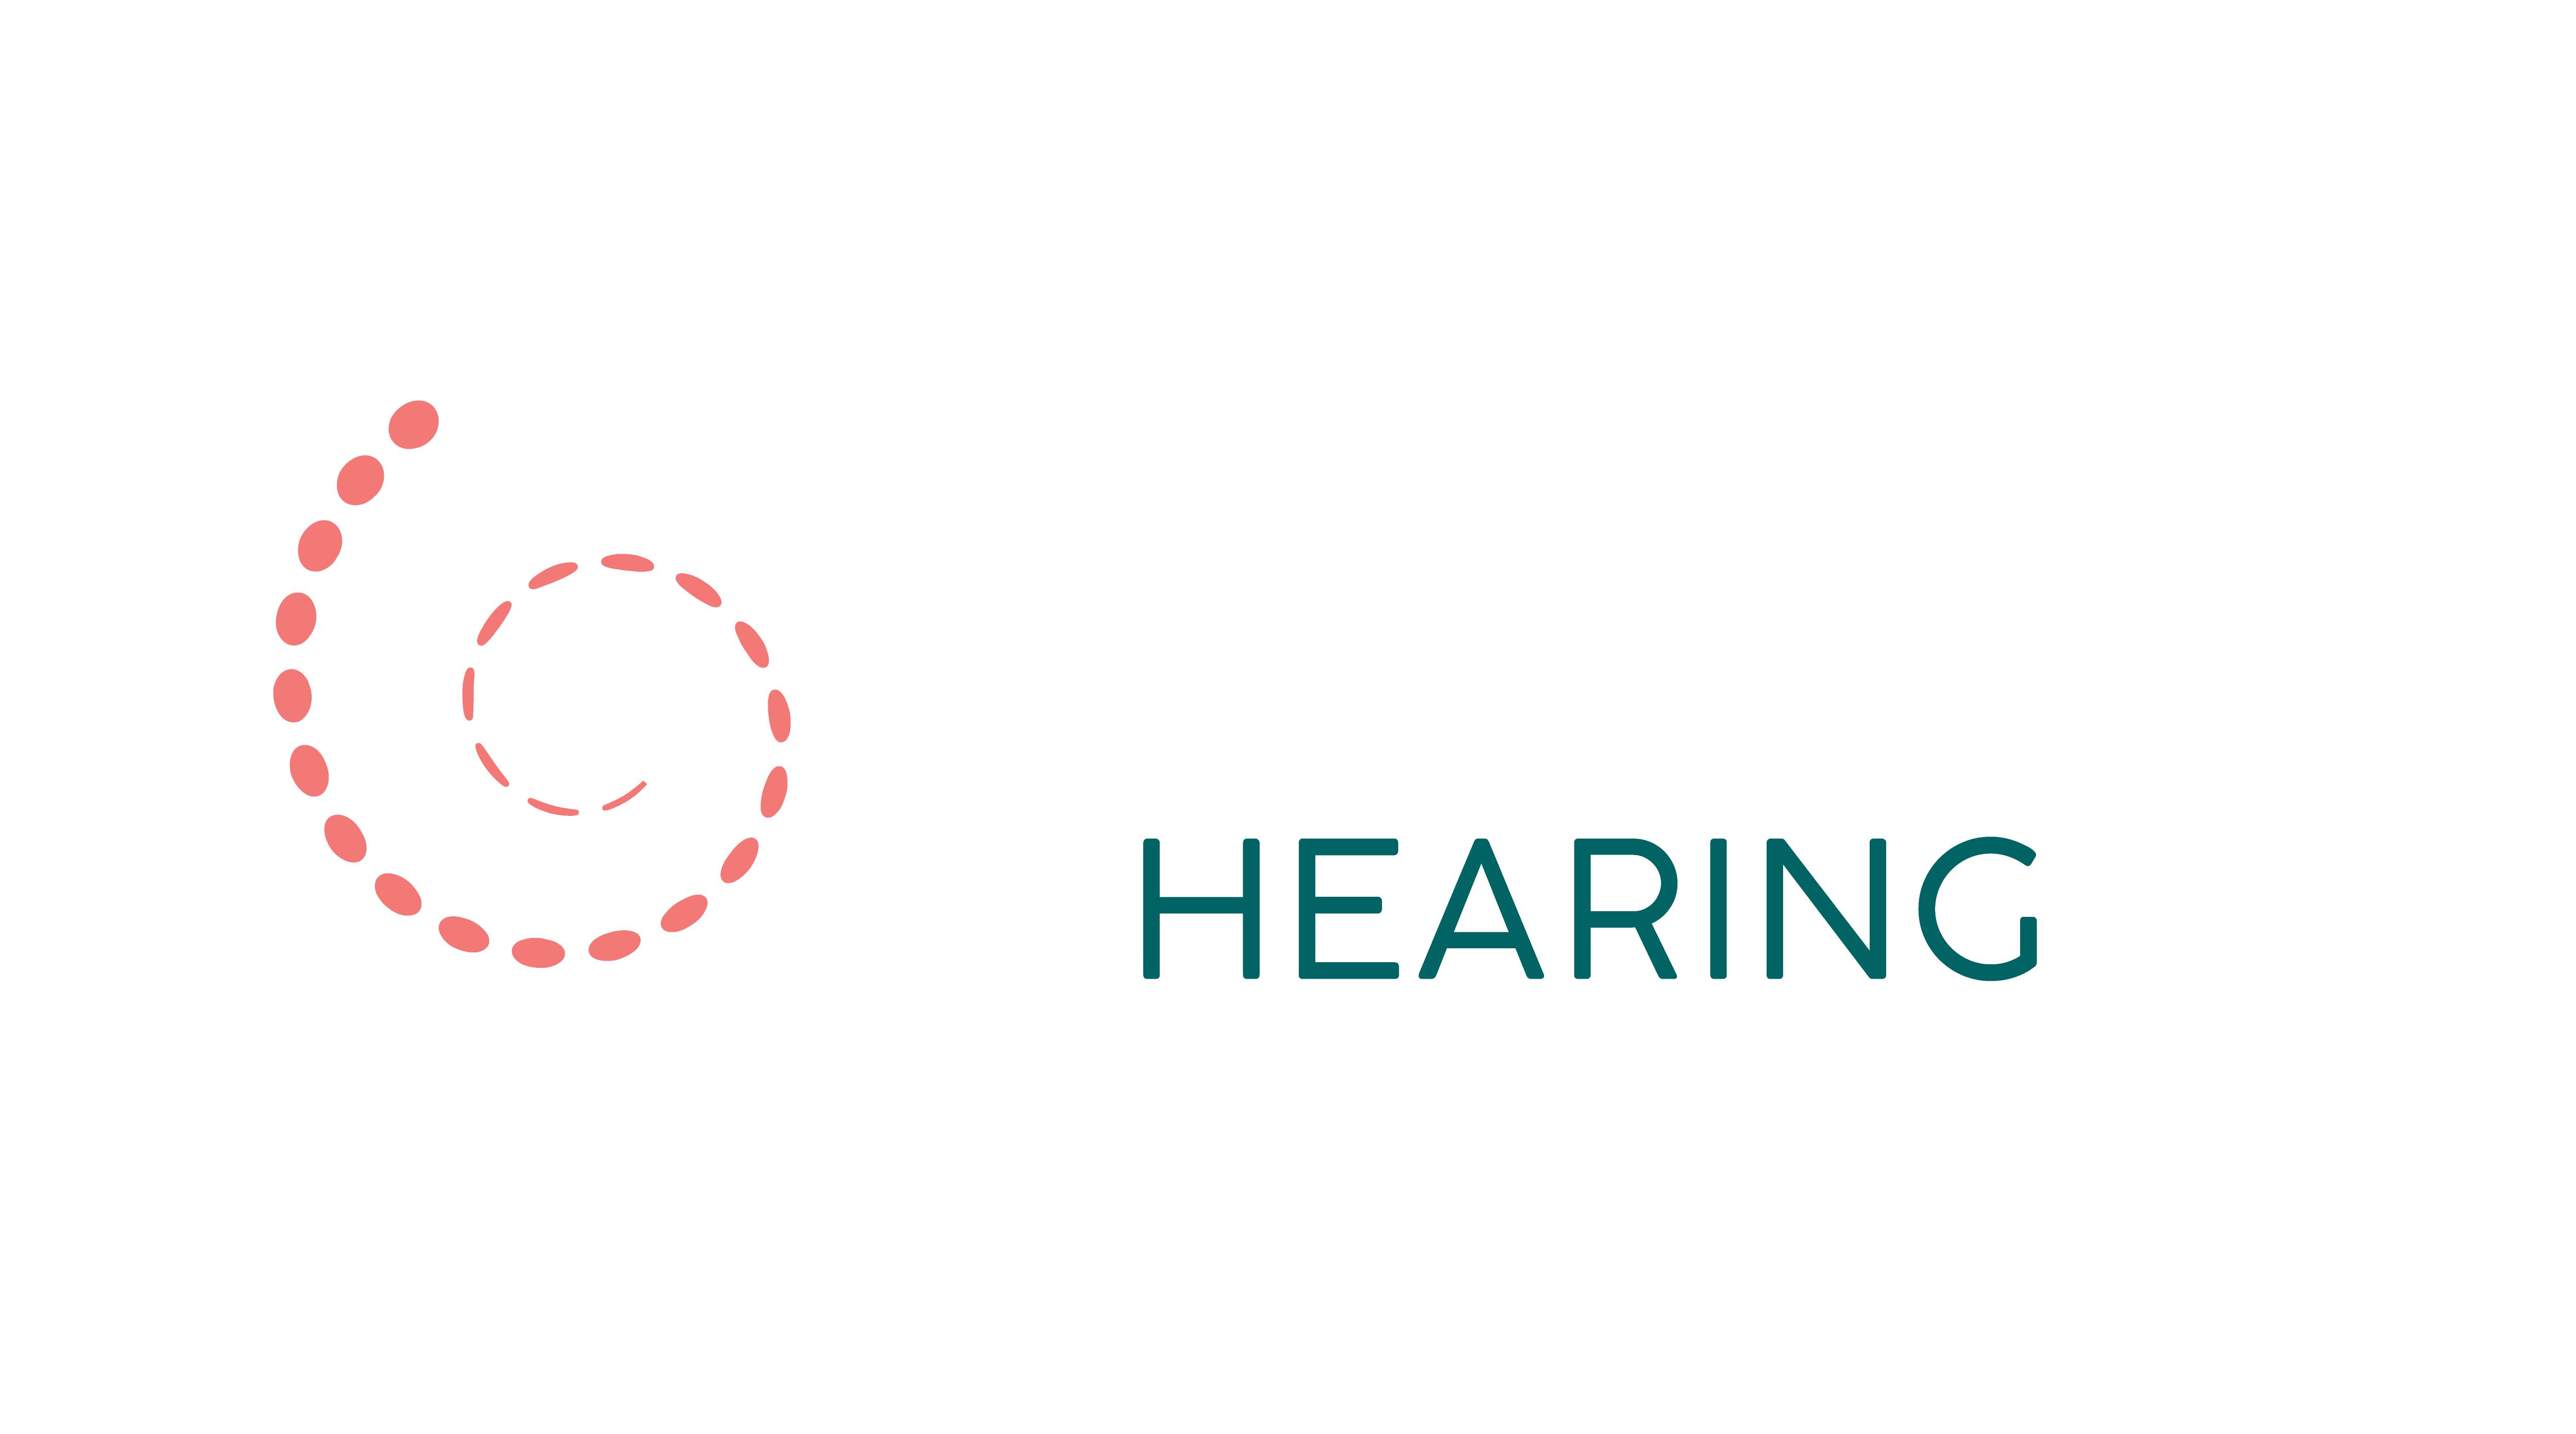 Infinite-hearing-logo_Tranparent_big